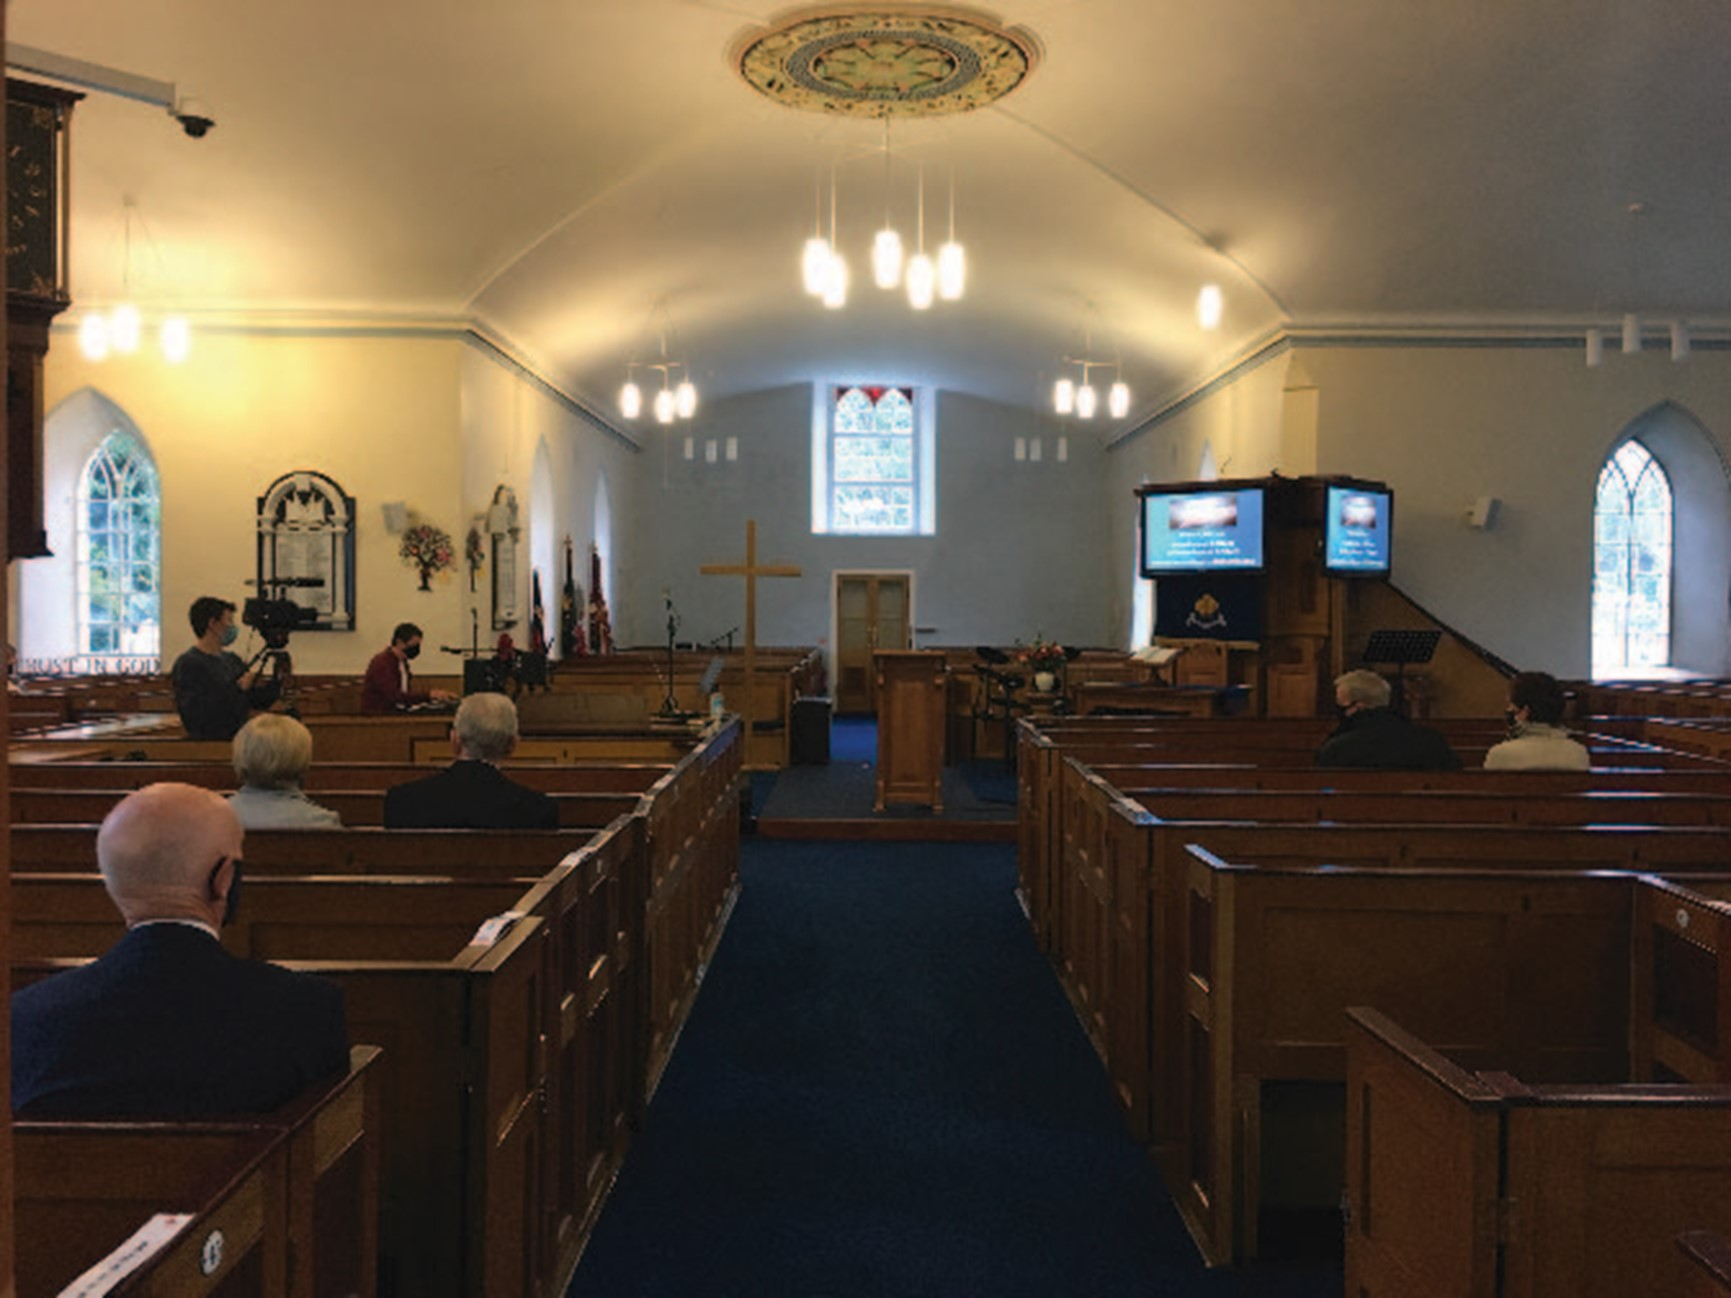 KILLINCHY, Killinchy Presbyterian Church Int